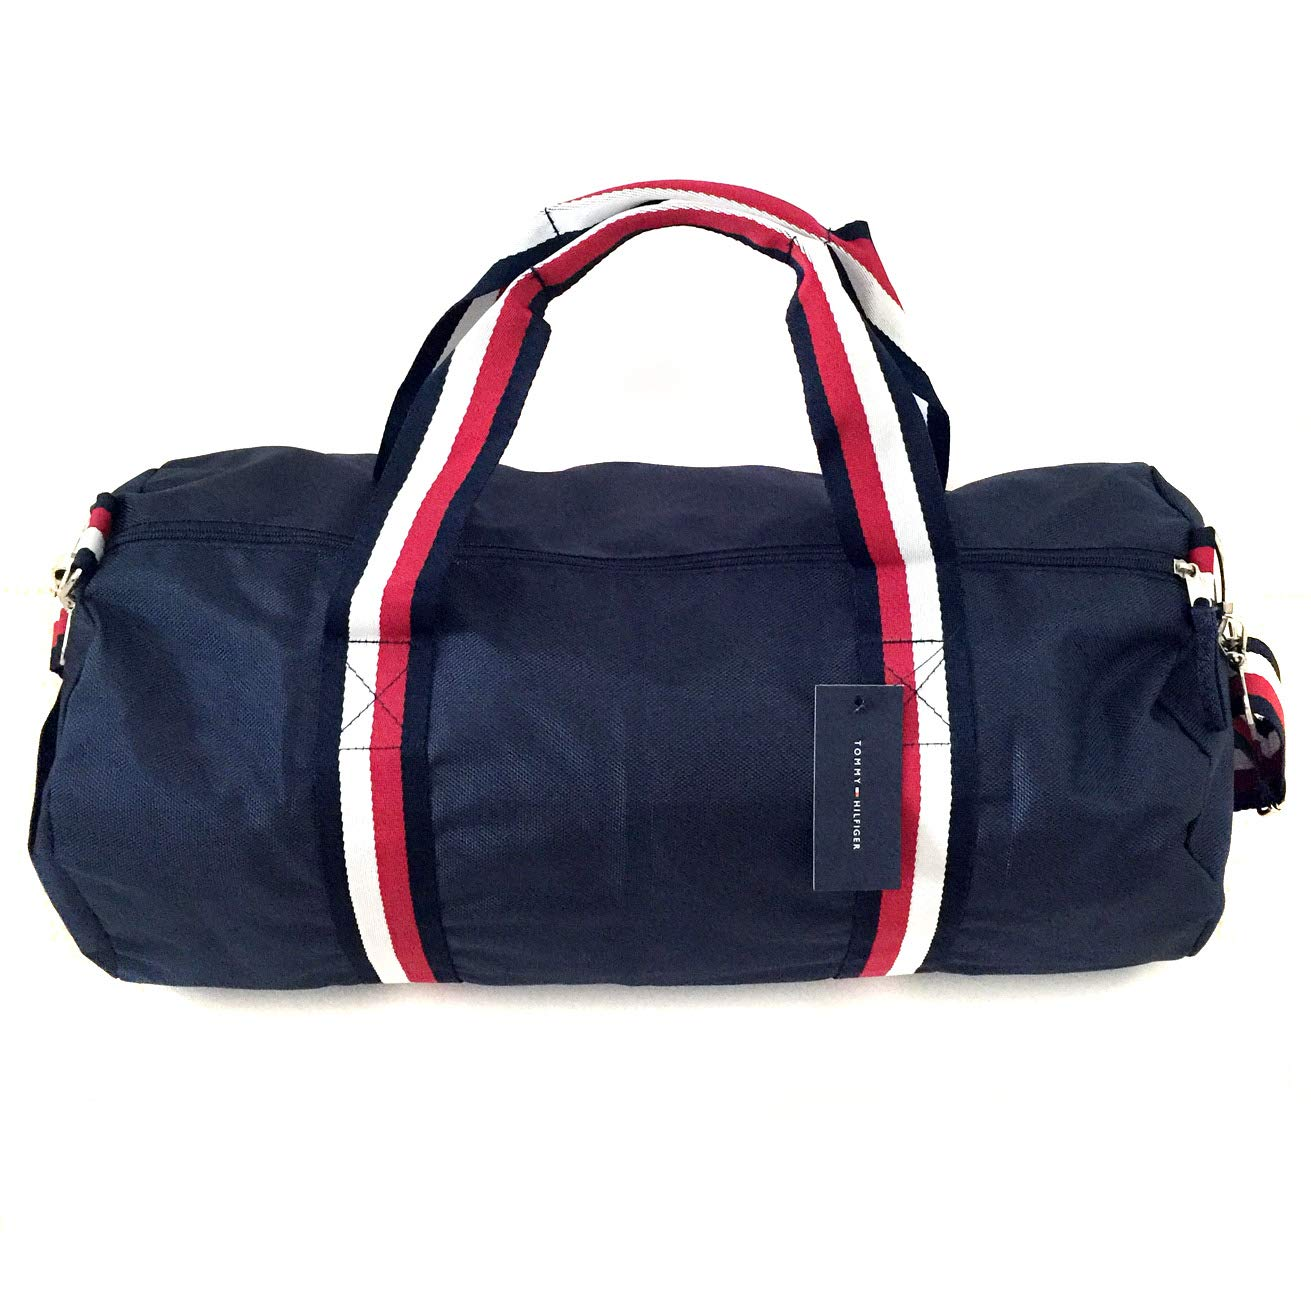 e8576dddfc Tommy Hilfiger Duffle Bag, Sport Bag, Travel Bag Large 55 x 30 x 30cm:  Amazon.co.uk: Sports & Outdoors